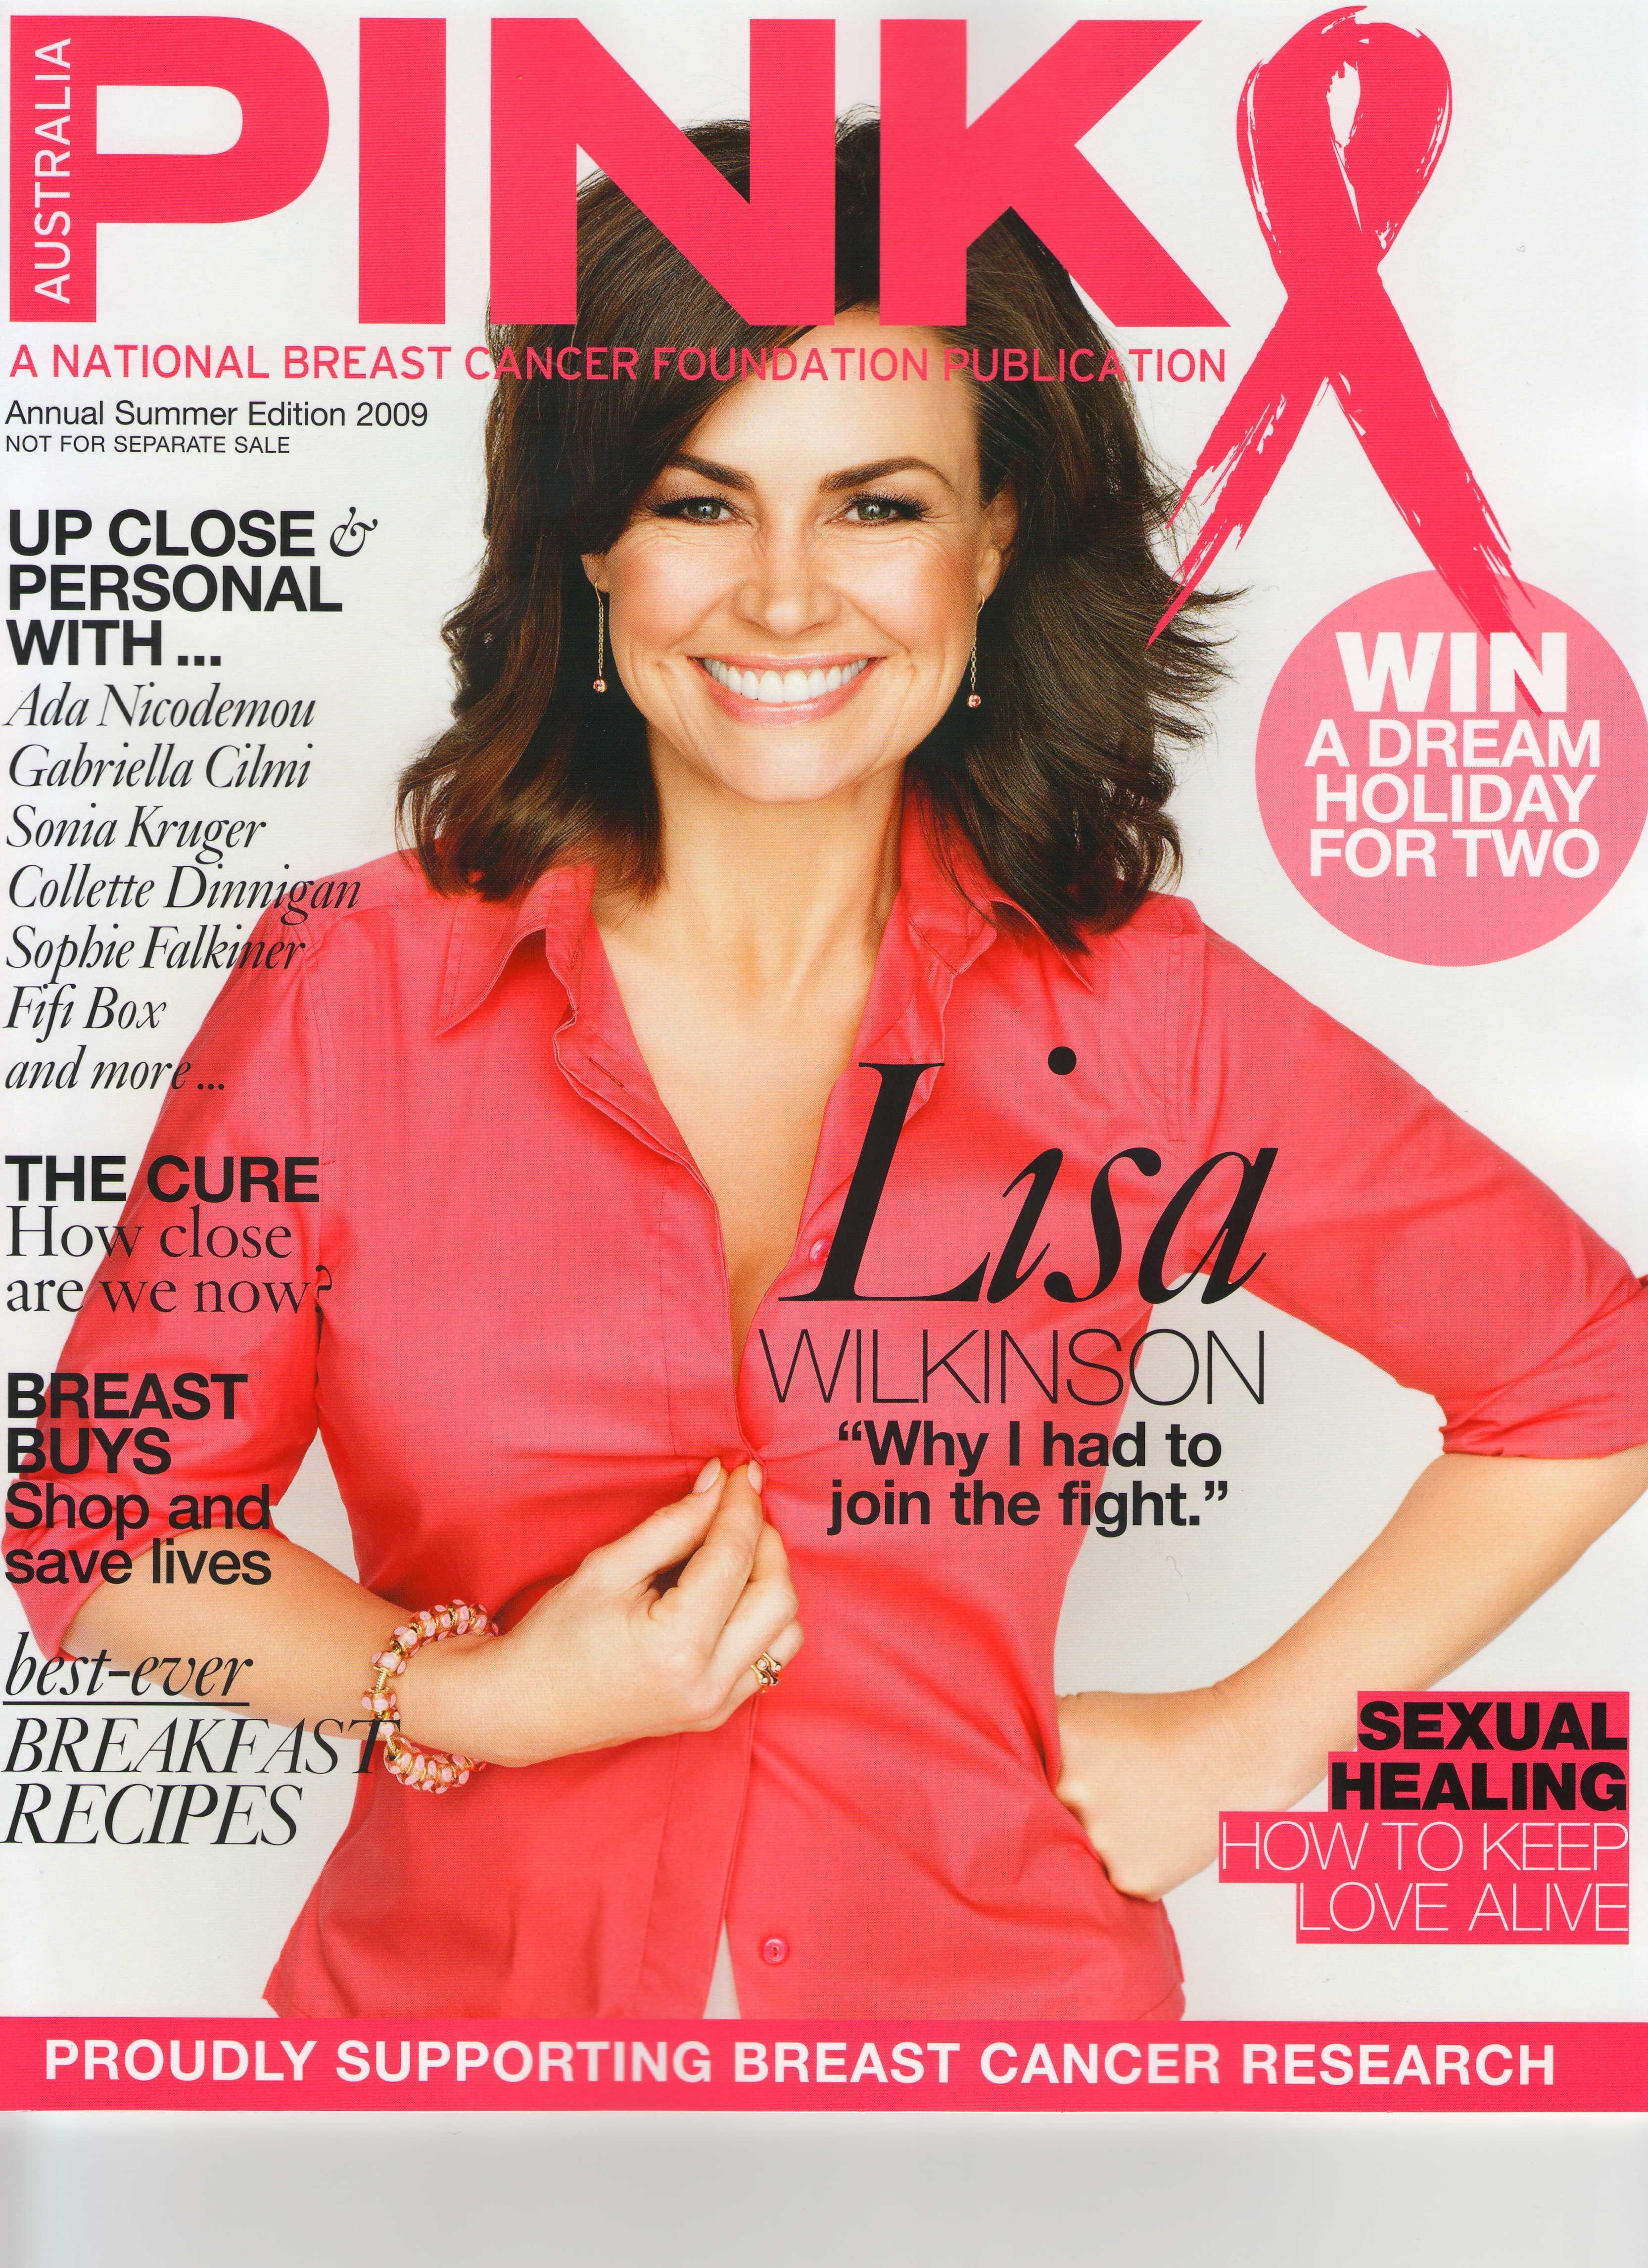 PINK Ribbon magazine 2009 - cover